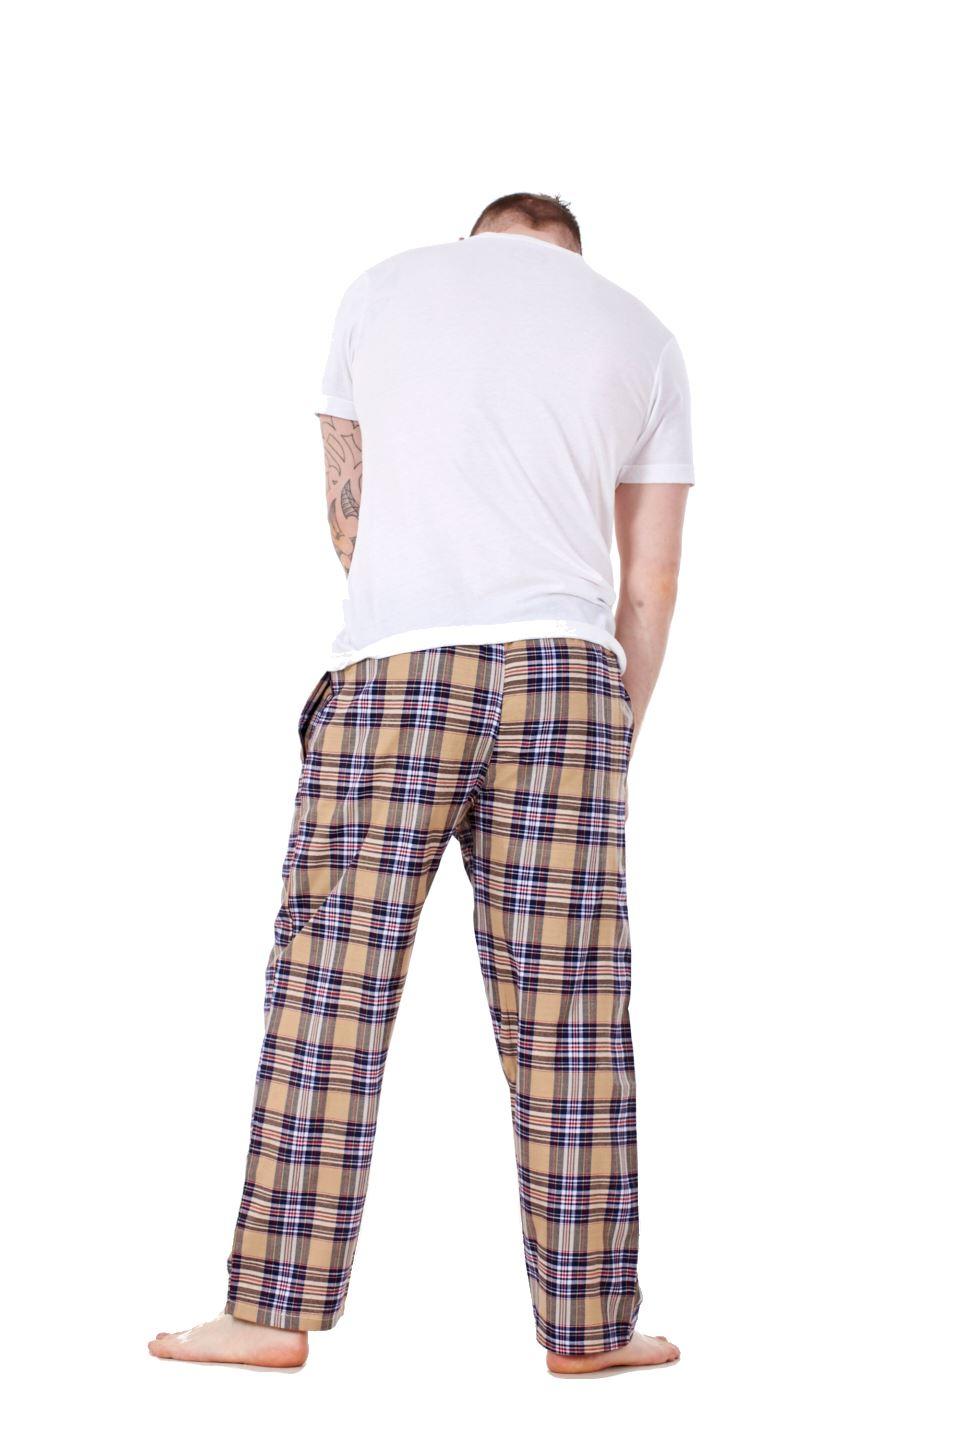 Mens-Pyjama-Bottoms-Rich-Cotton-Woven-Check-Lounge-Pant-Nightwear-Big-3XL-to-5XL Indexbild 28